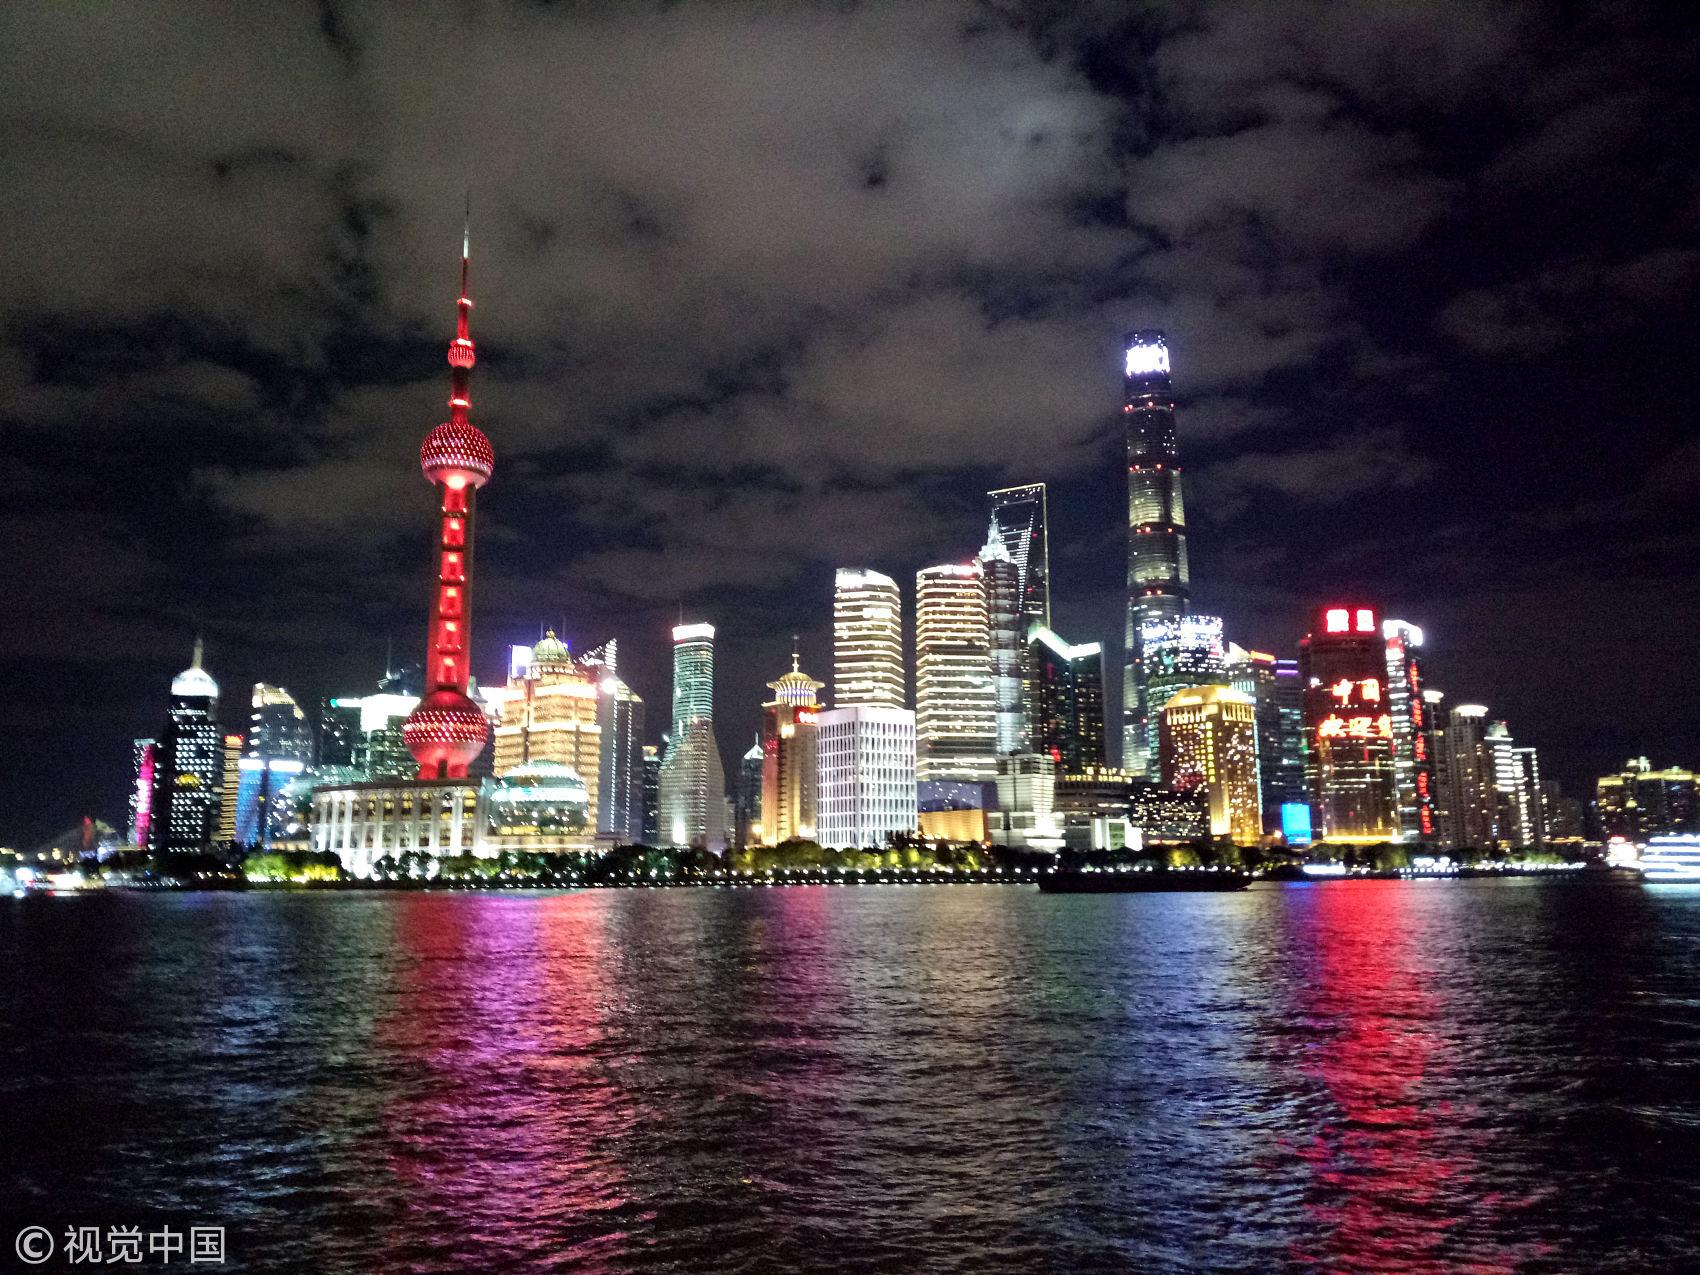 Landscape lighting upgraded in Shanghai for CIIE